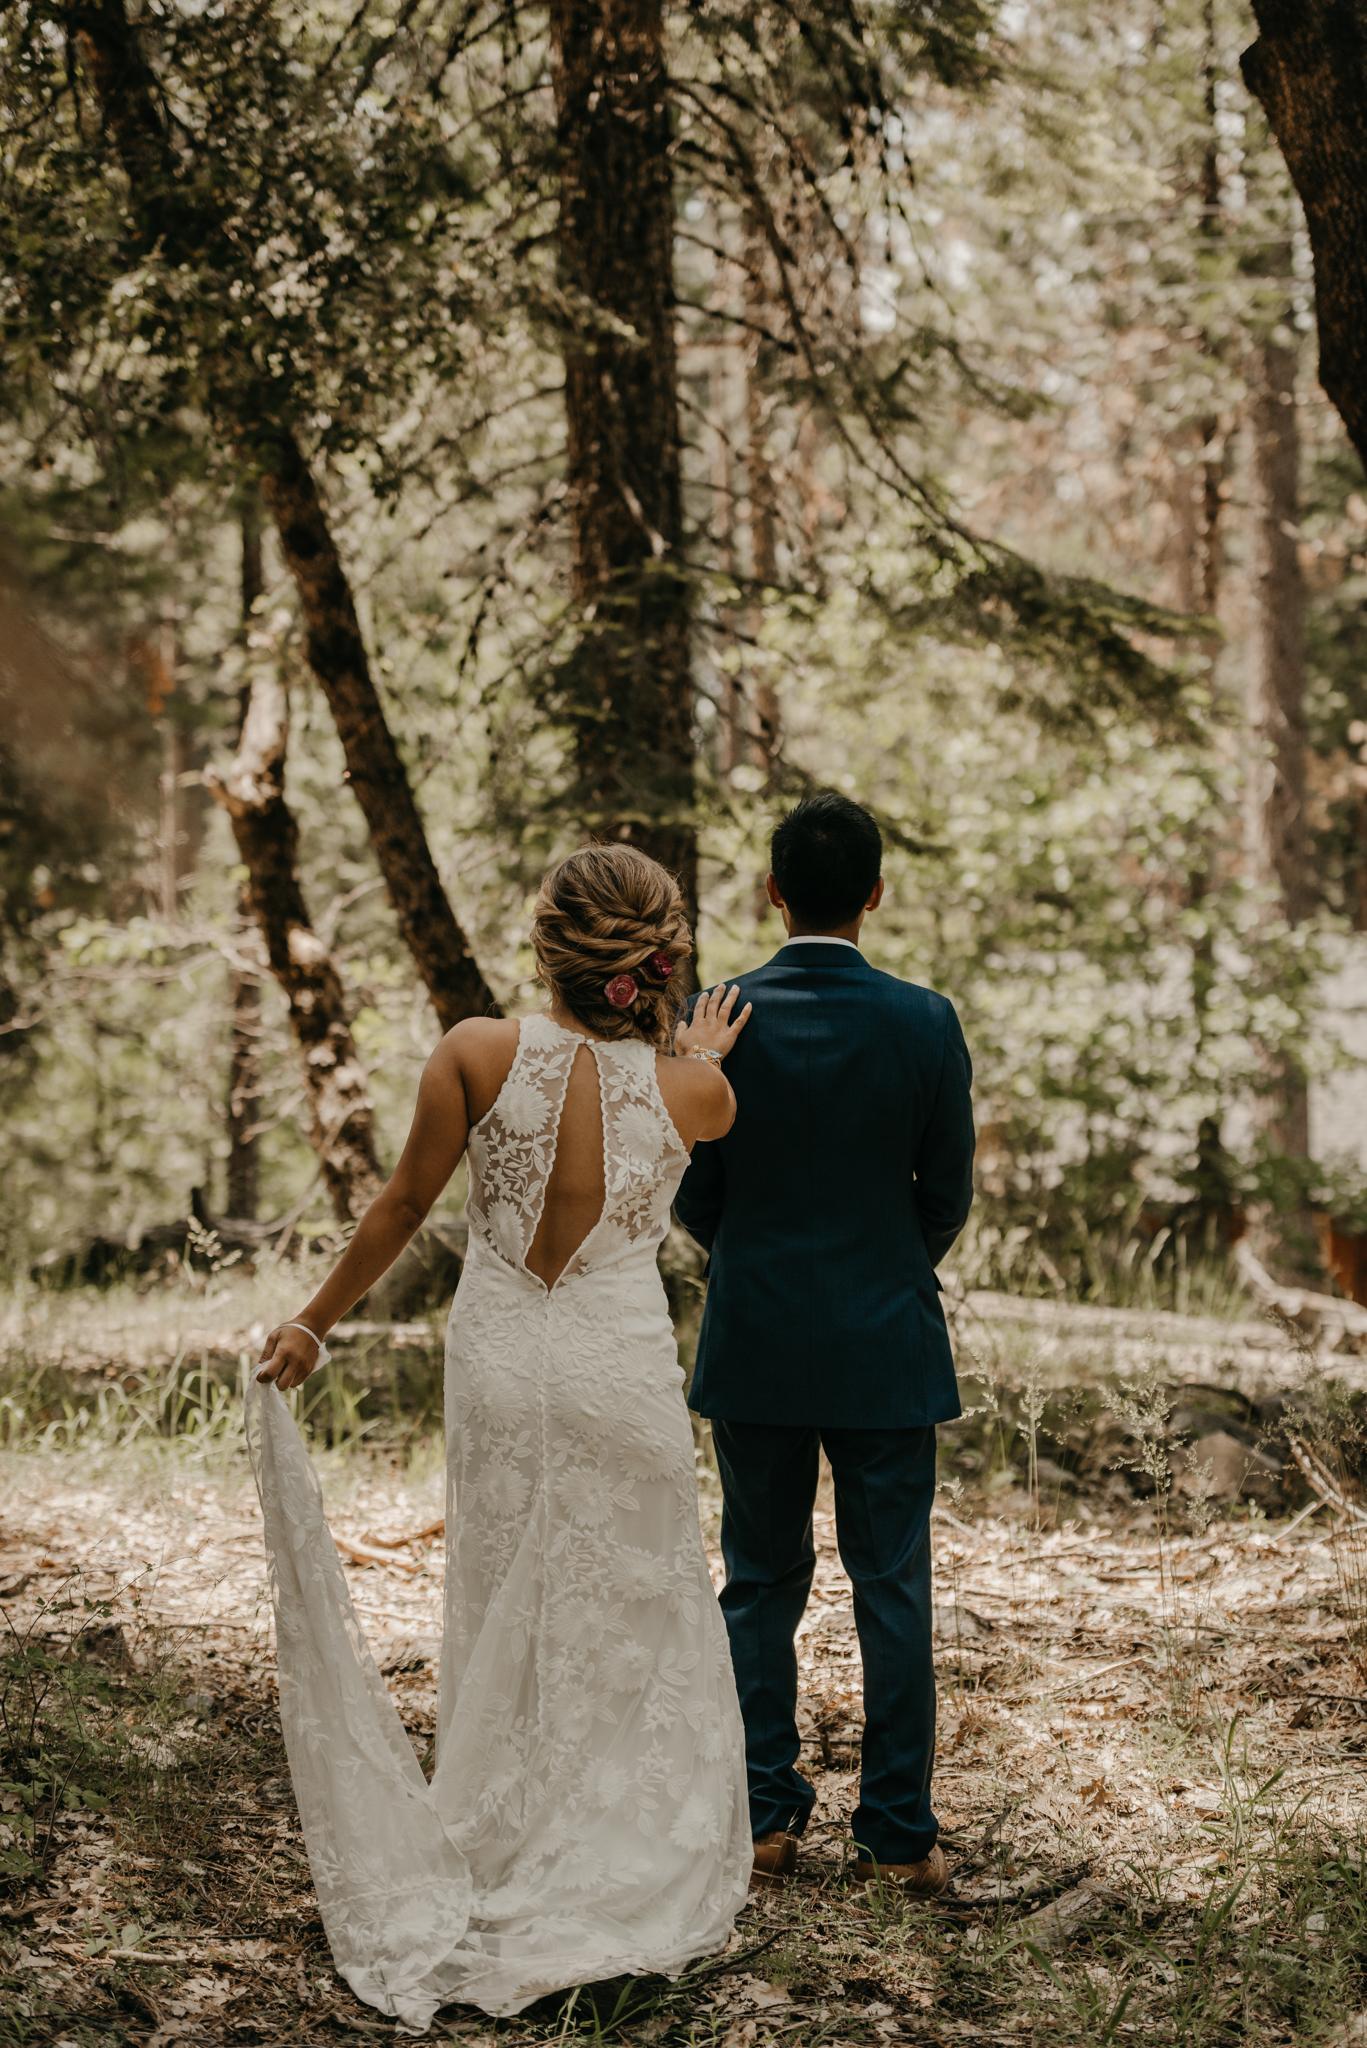 © Isaiah + Taylor Photography - Evergreen Lodge Destination Yoesmite Wedding - Los Angeles Wedding Photographer-069.jpg